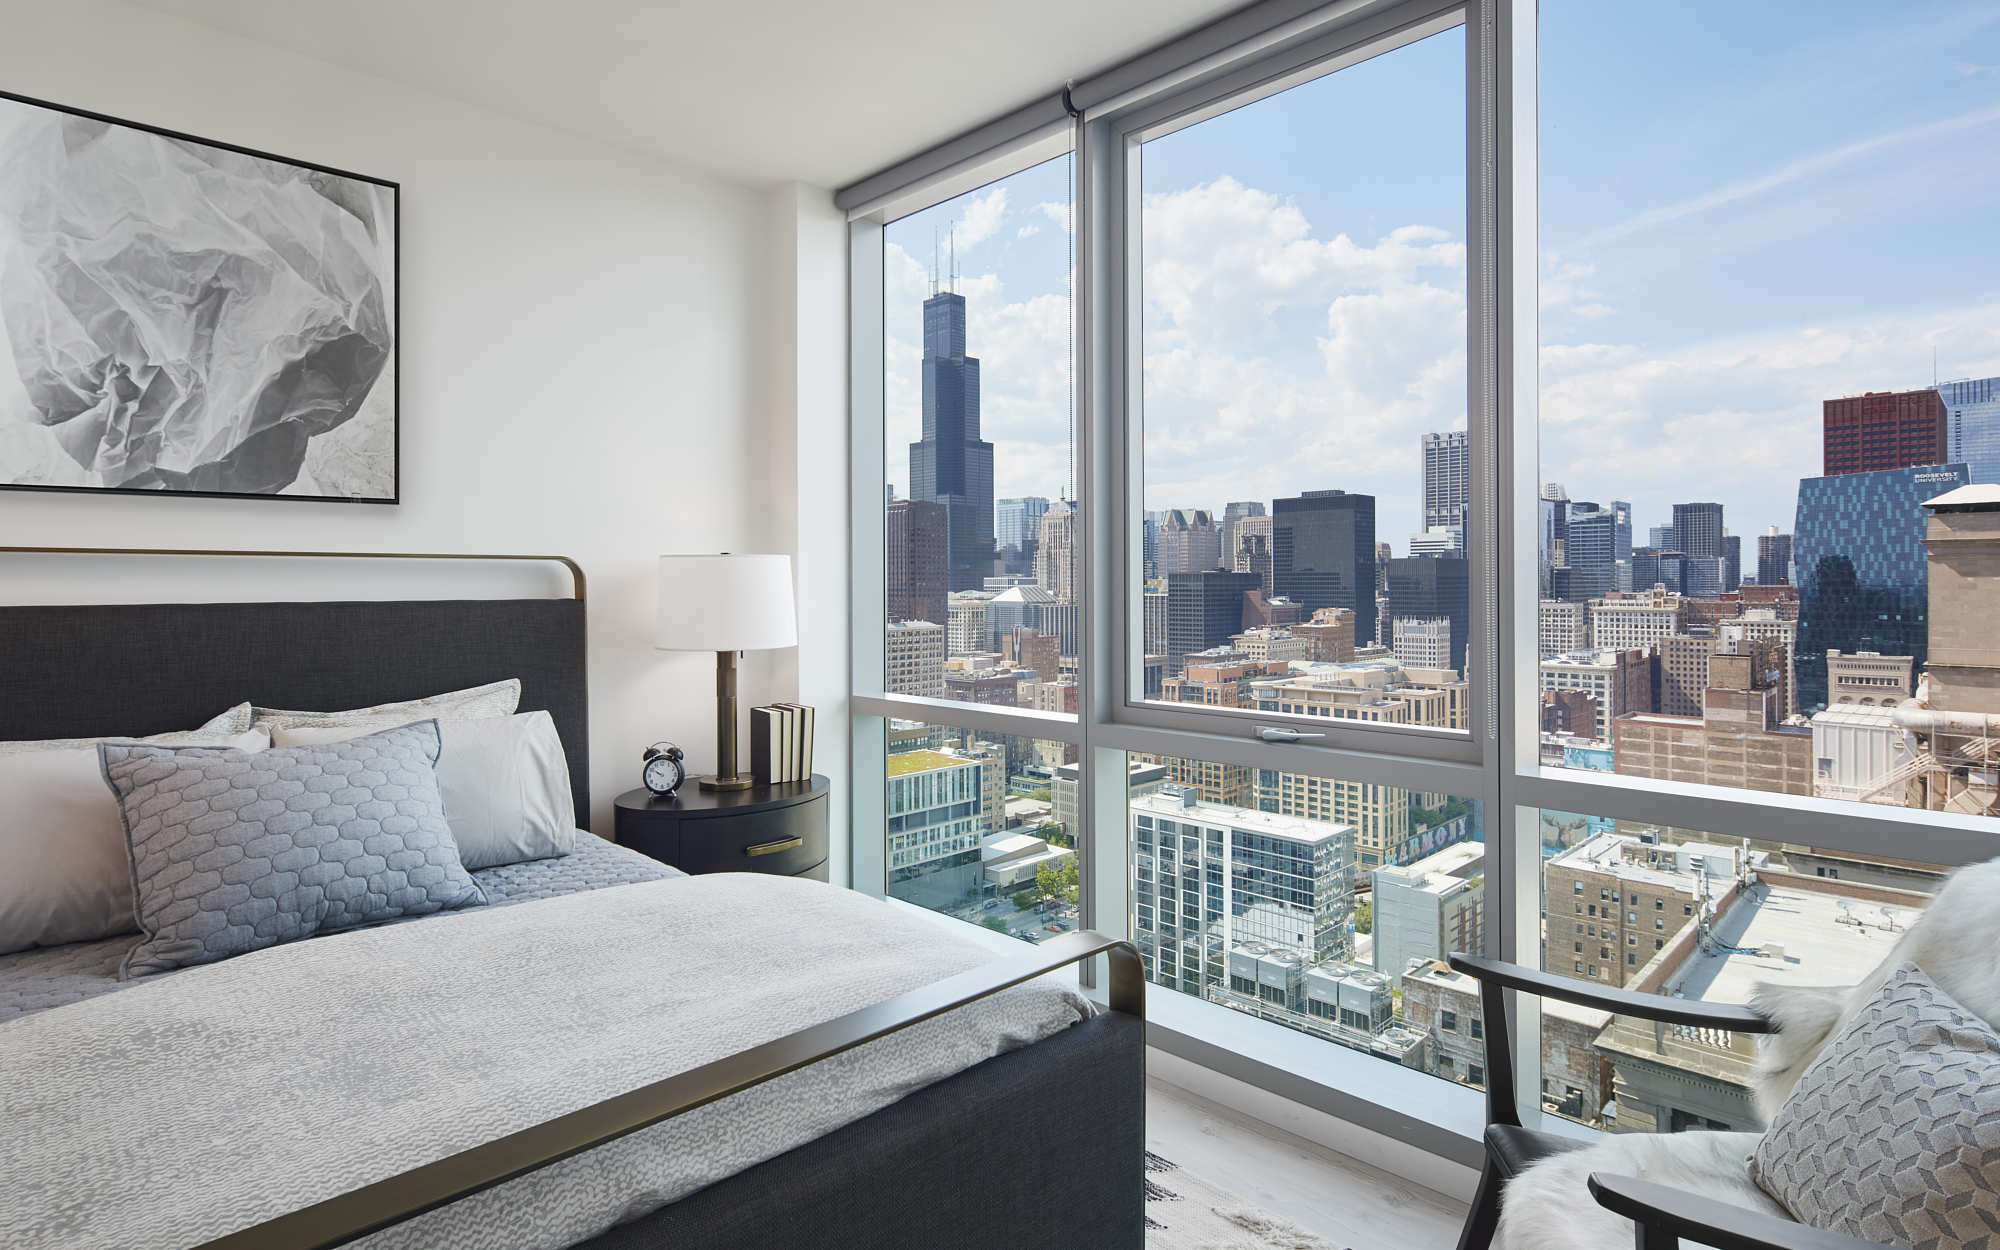 Essex Bedroom with open windows and skyscraper view